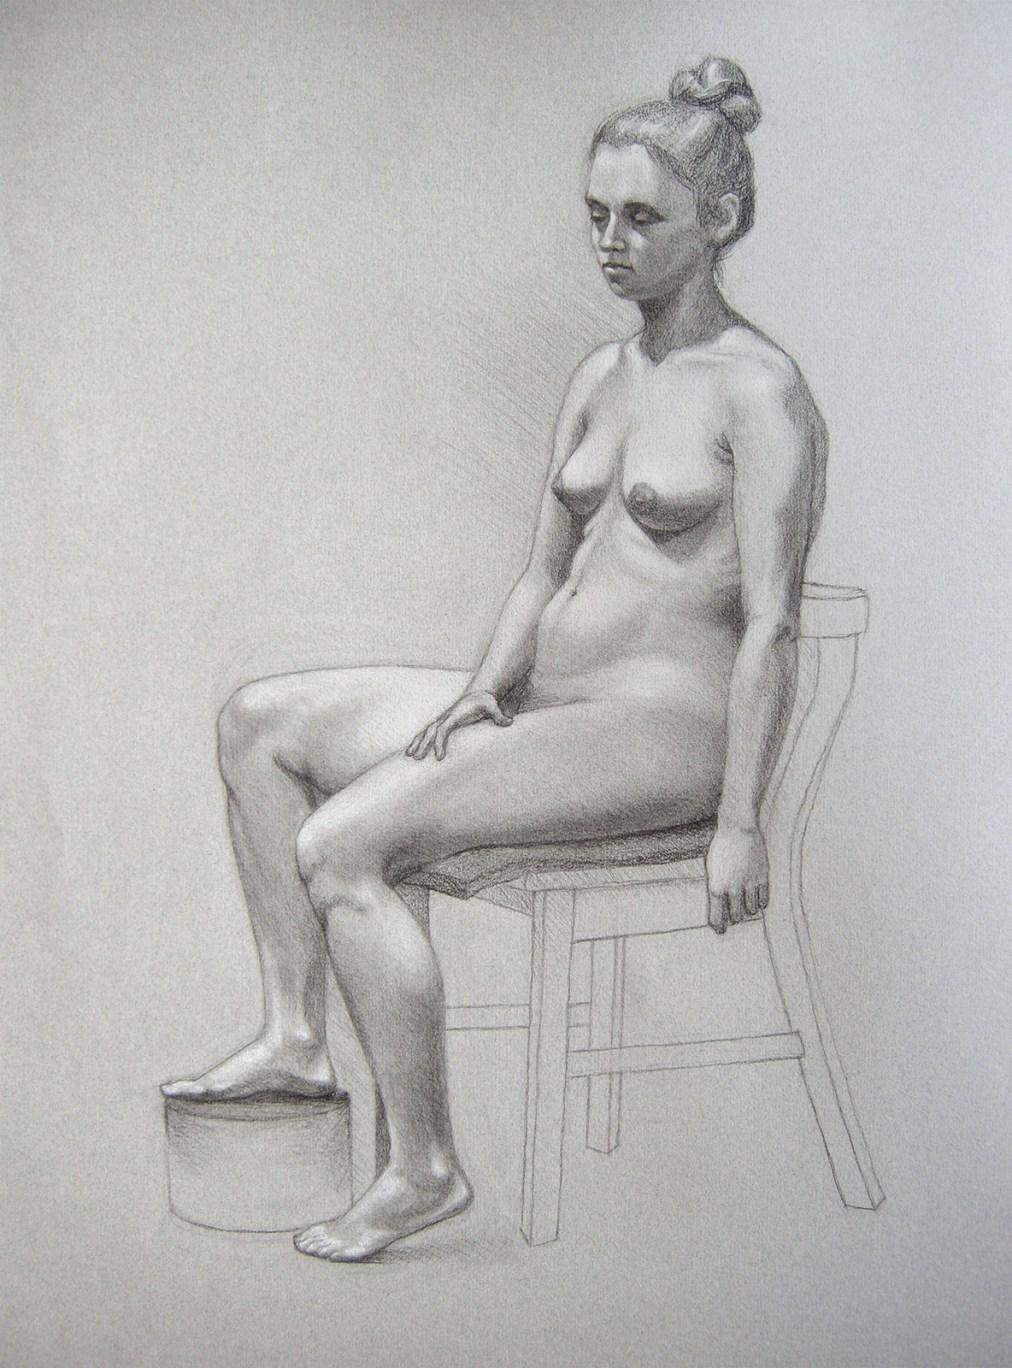 Lady seated by Tatyana Deniz, charcoal on paper, 2011